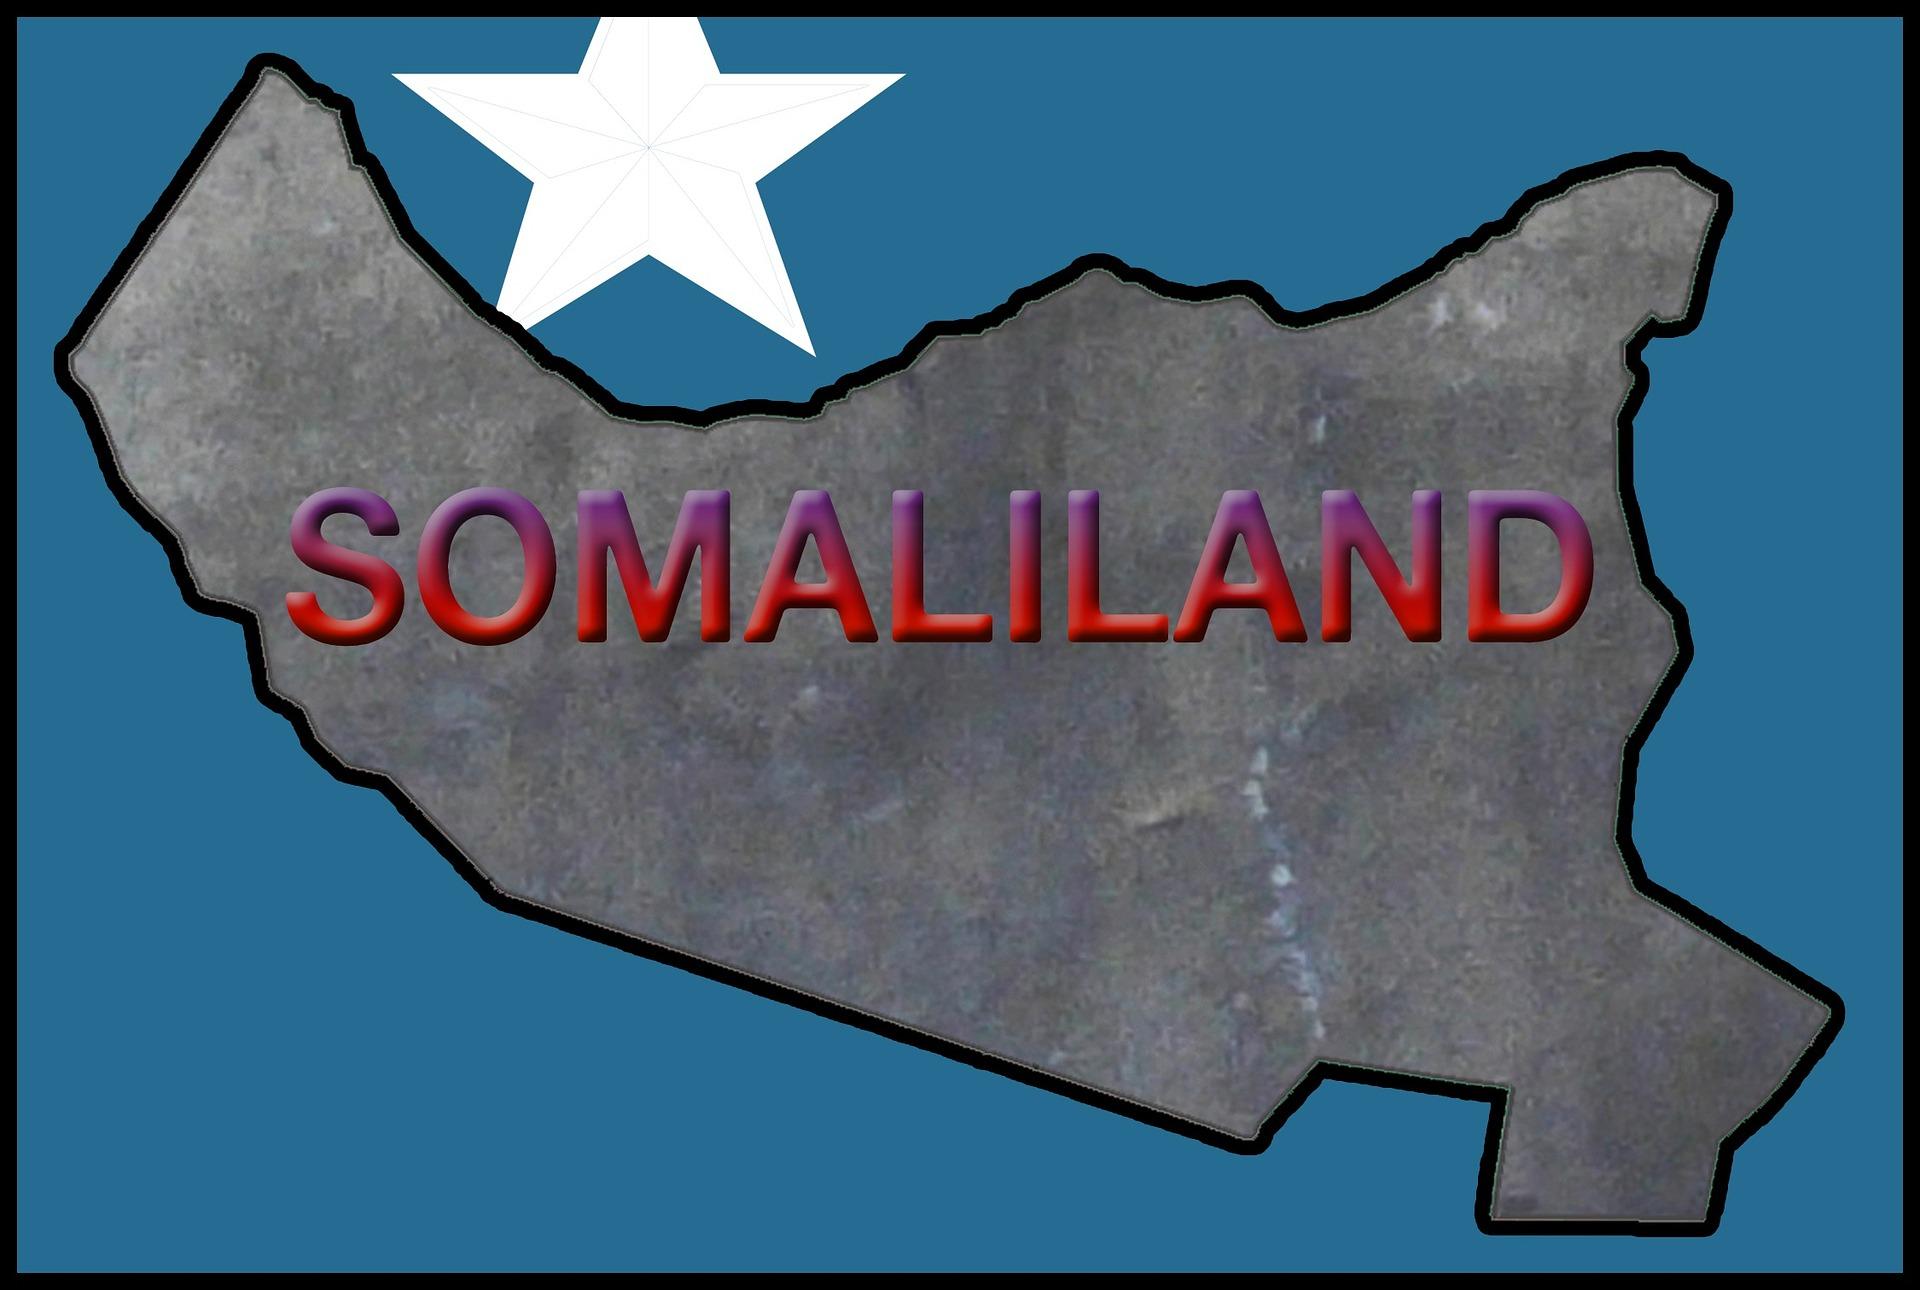 Somaliland, nord Corno d'Africa